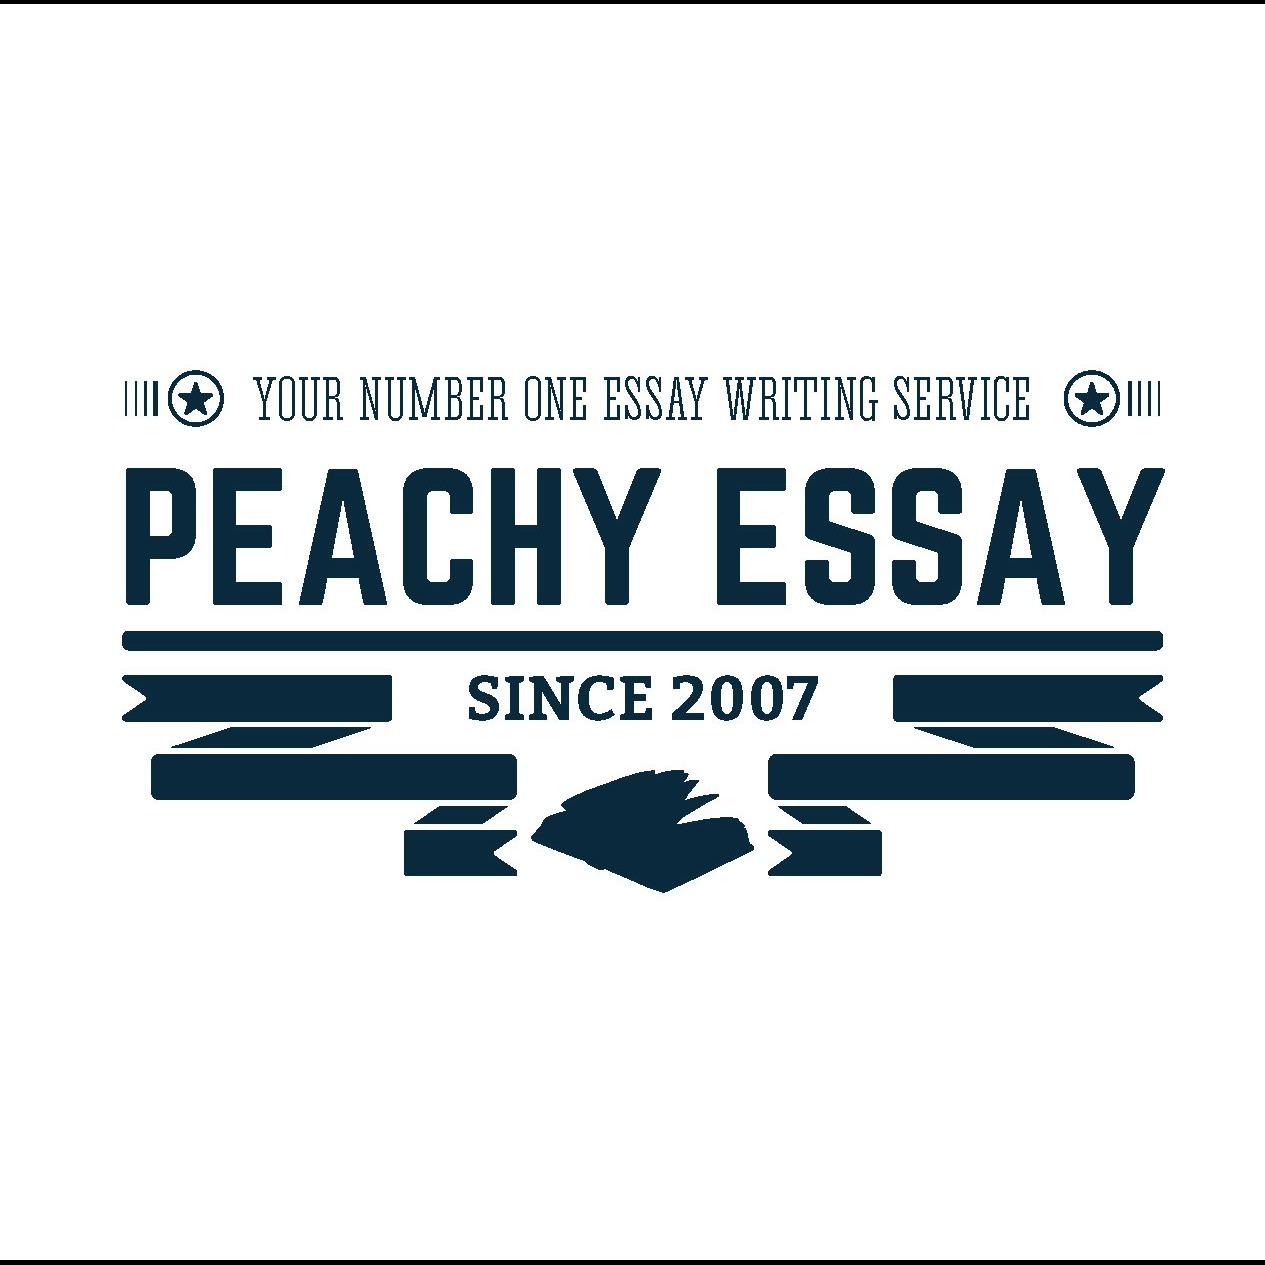 Peachy Essay